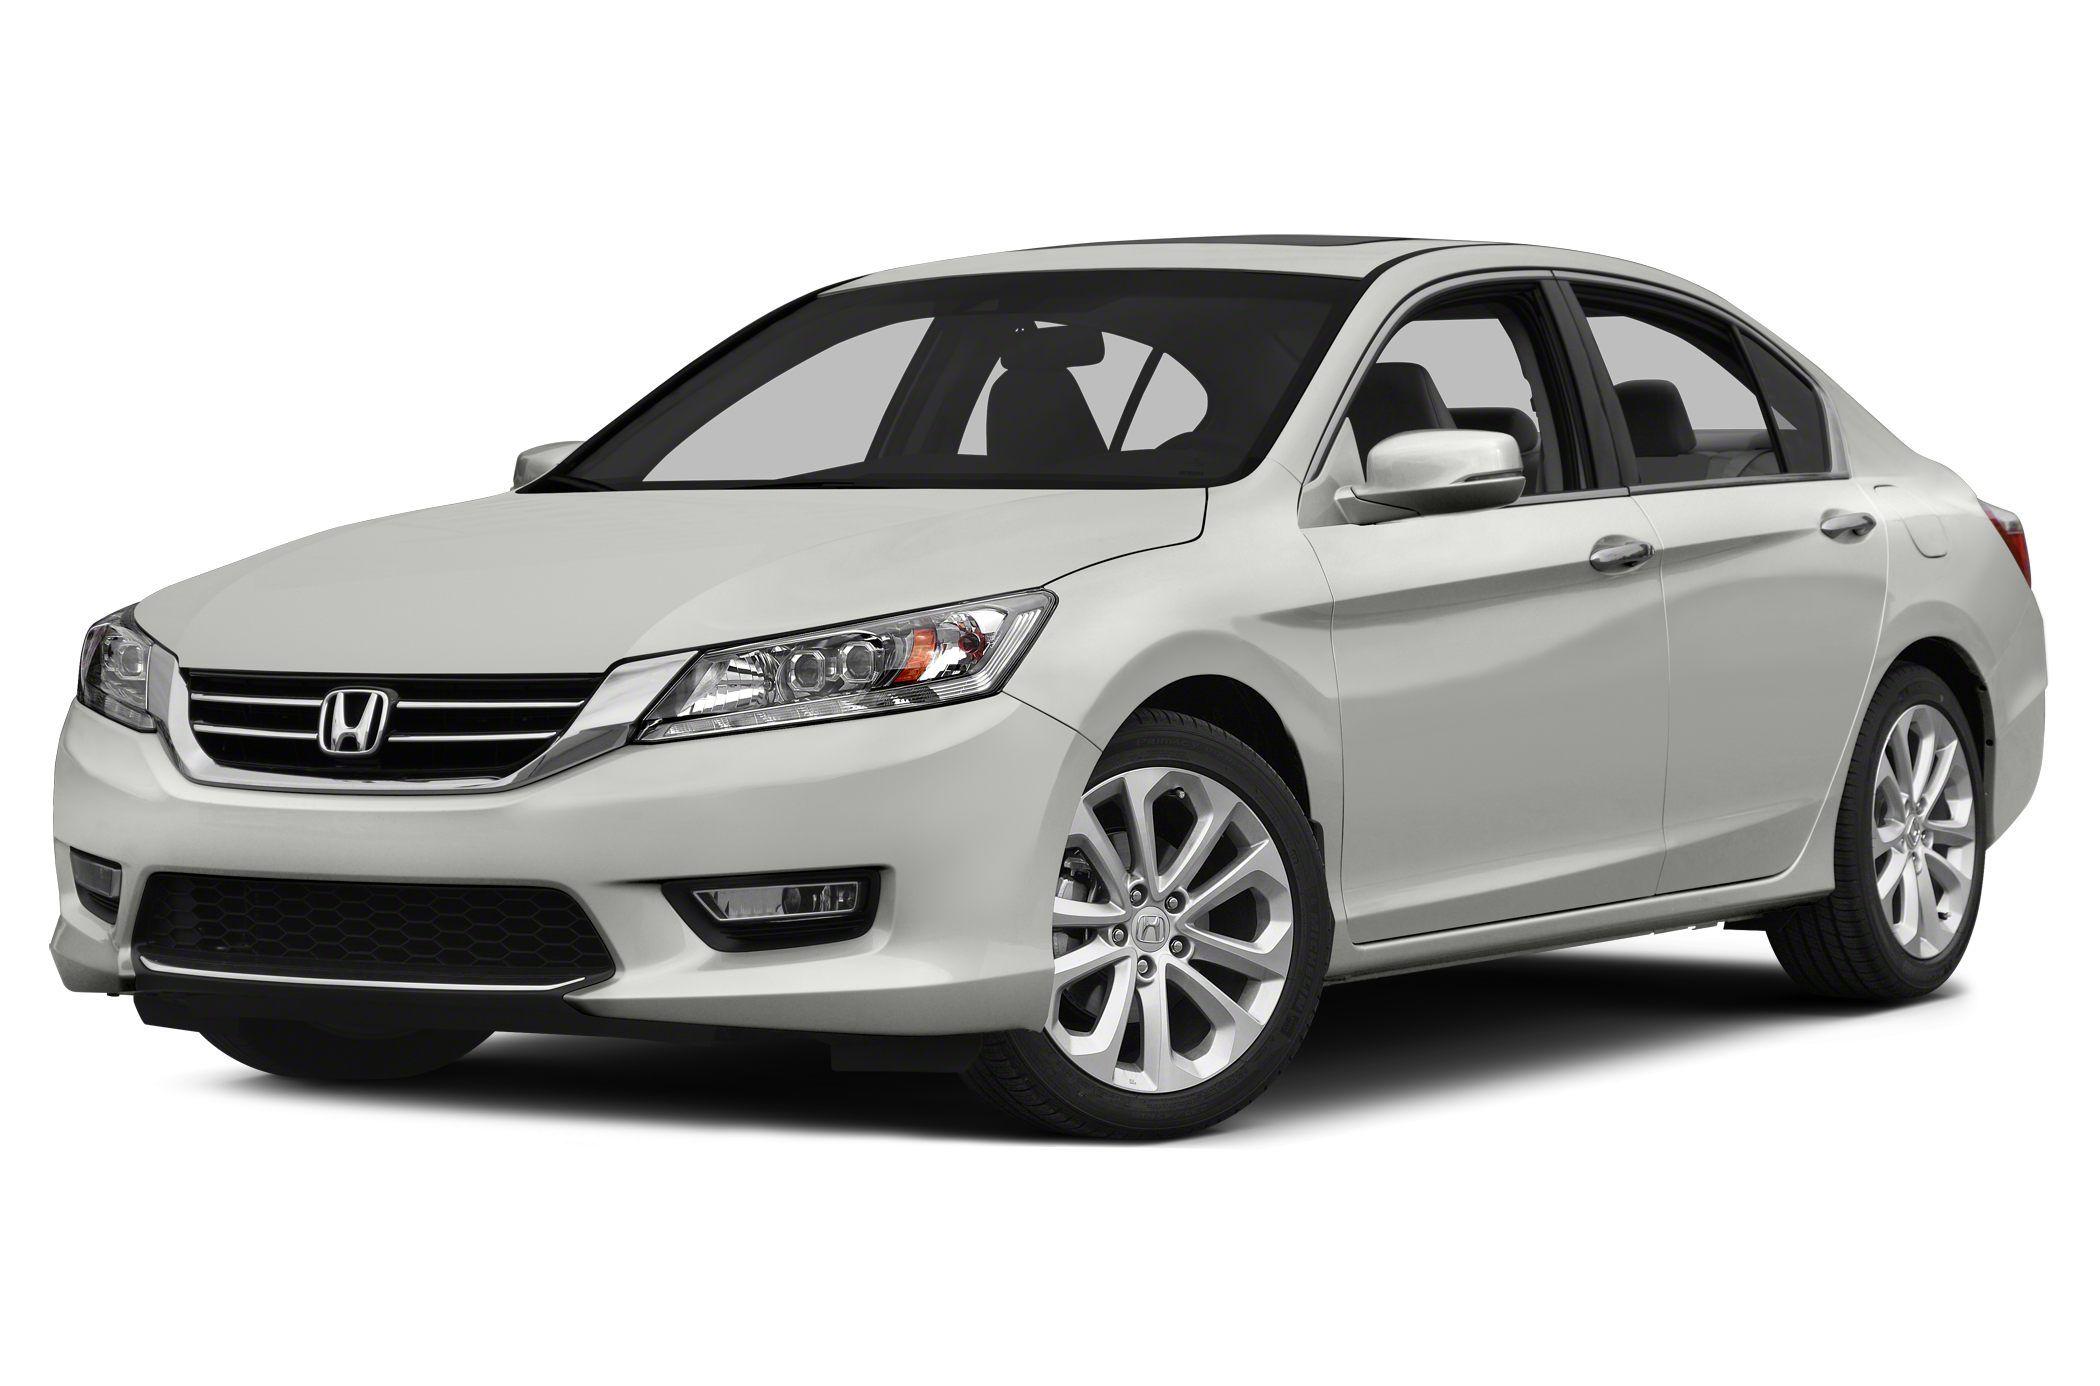 Honda Accord Front Angle High Definition Wallpaper WOW - 2015 honda accord invoice price